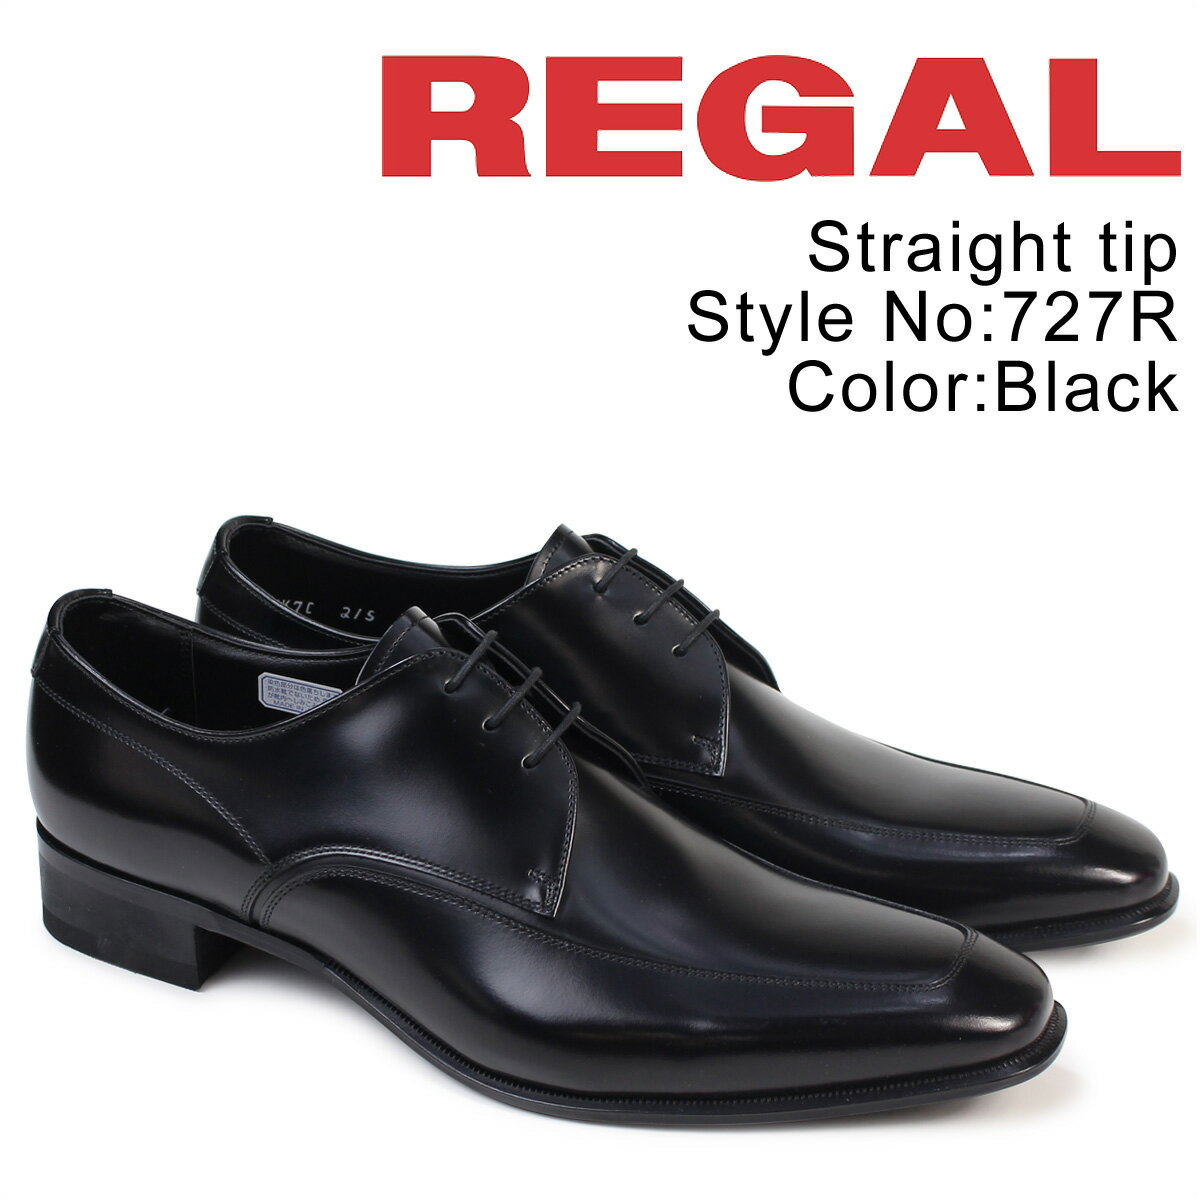 REGAL 靴 メンズ リーガル ビジネスシューズ 727R AL Uチップ  日本製 ブラック [9/14 追加入荷] [179]